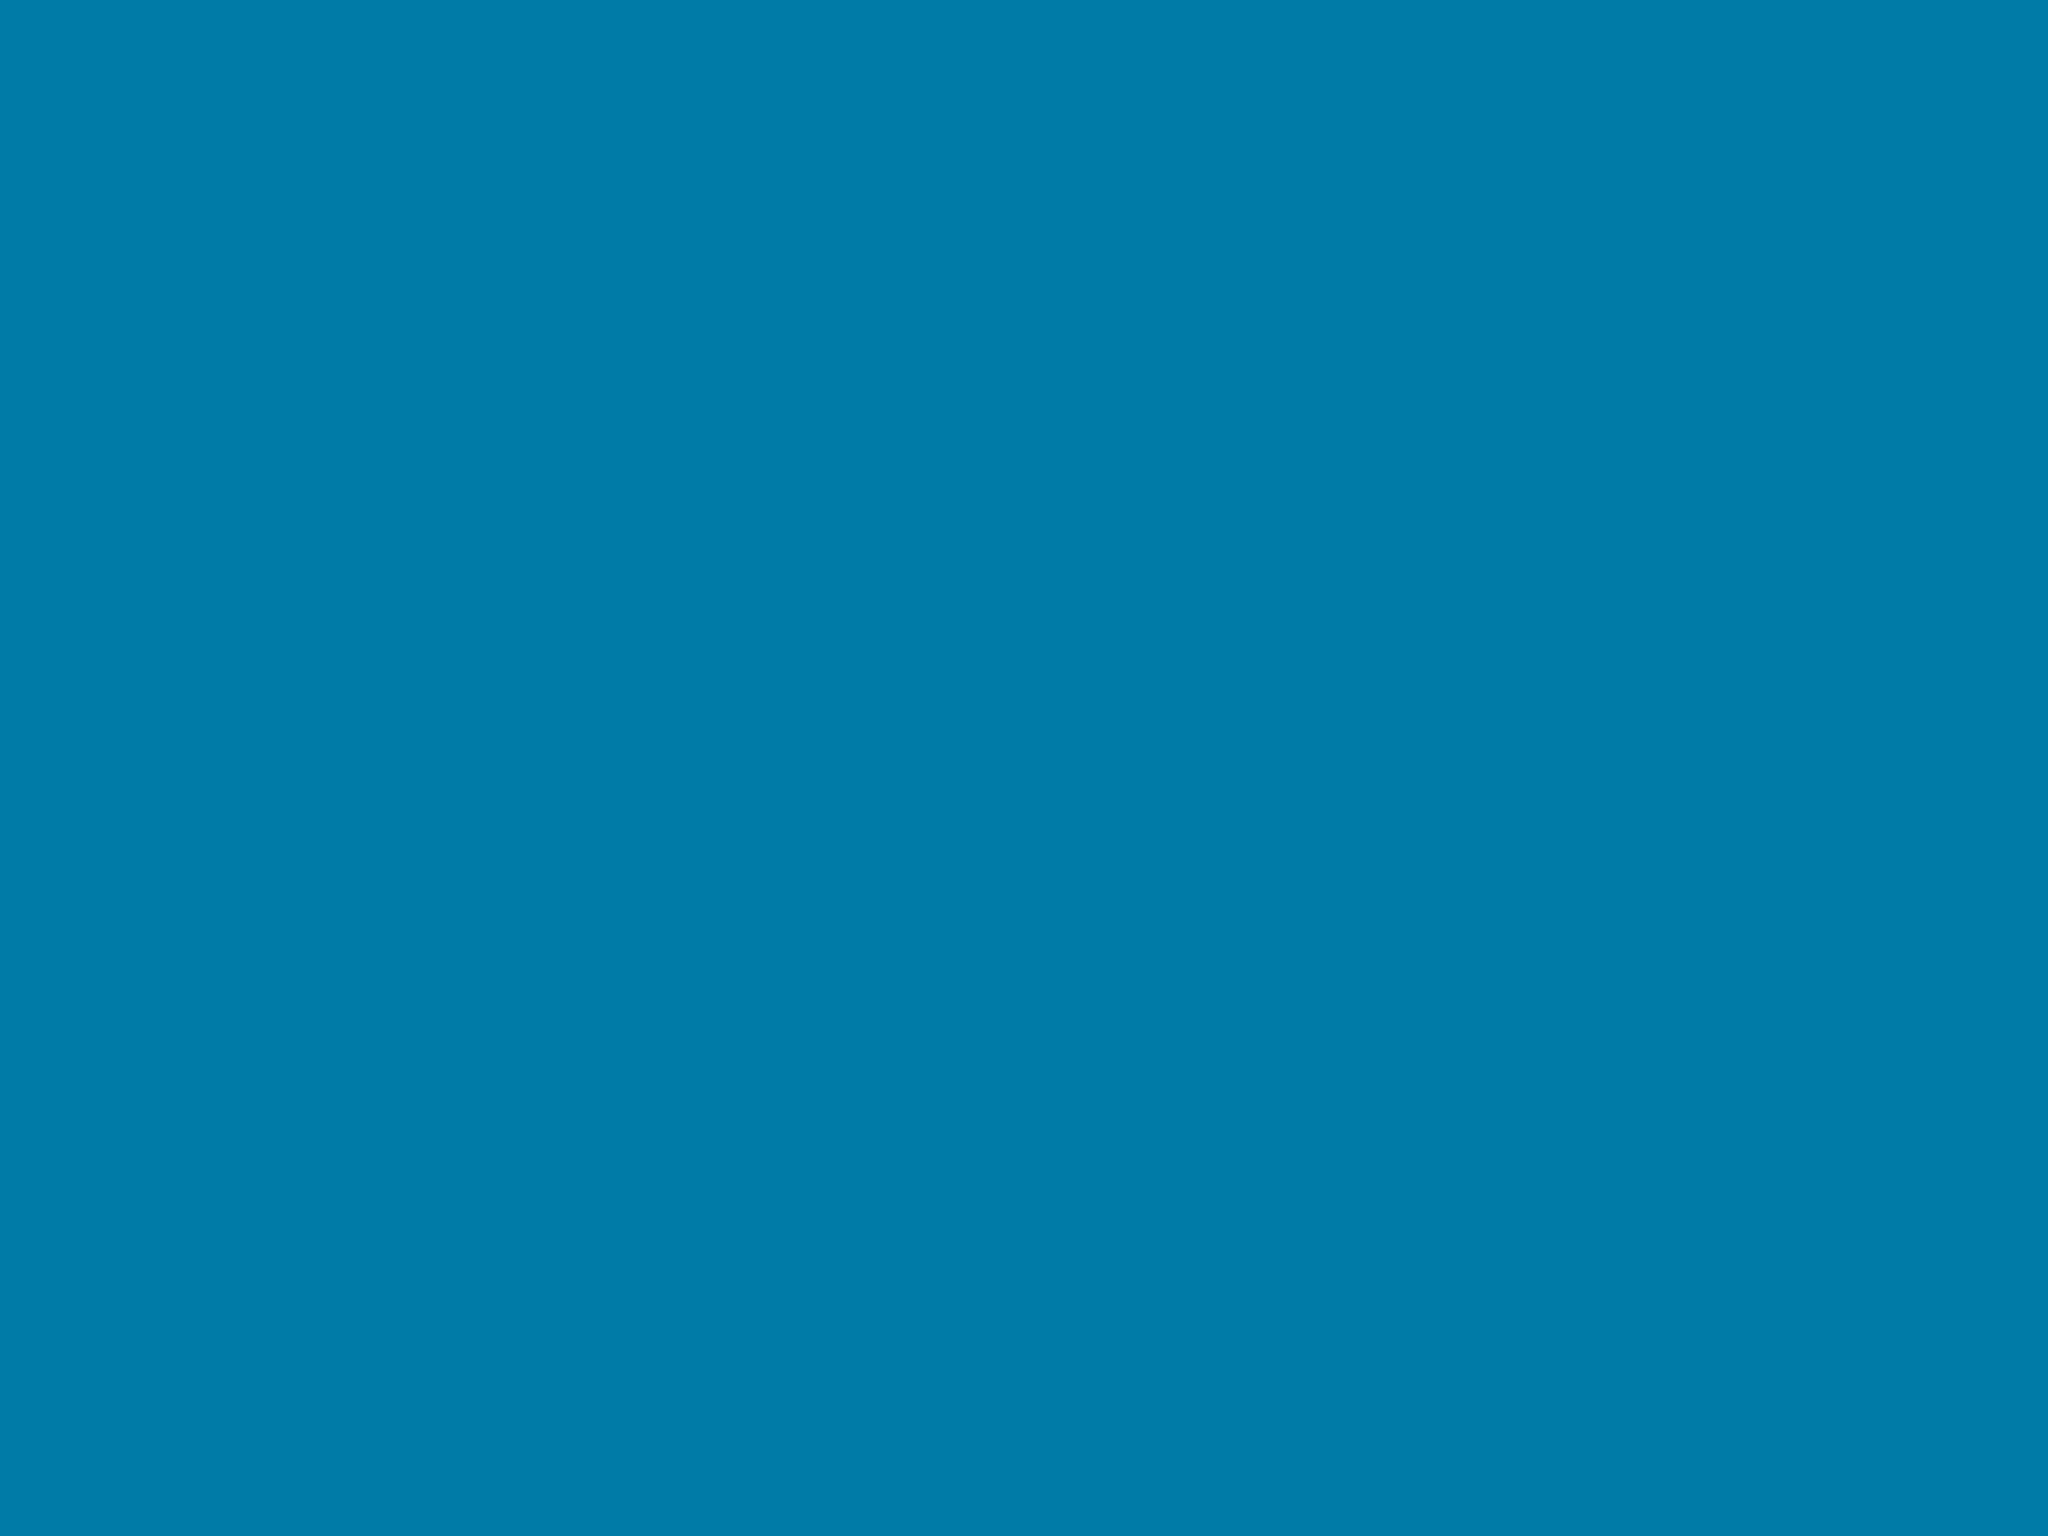 2048x1536 Celadon Blue Solid Color Background